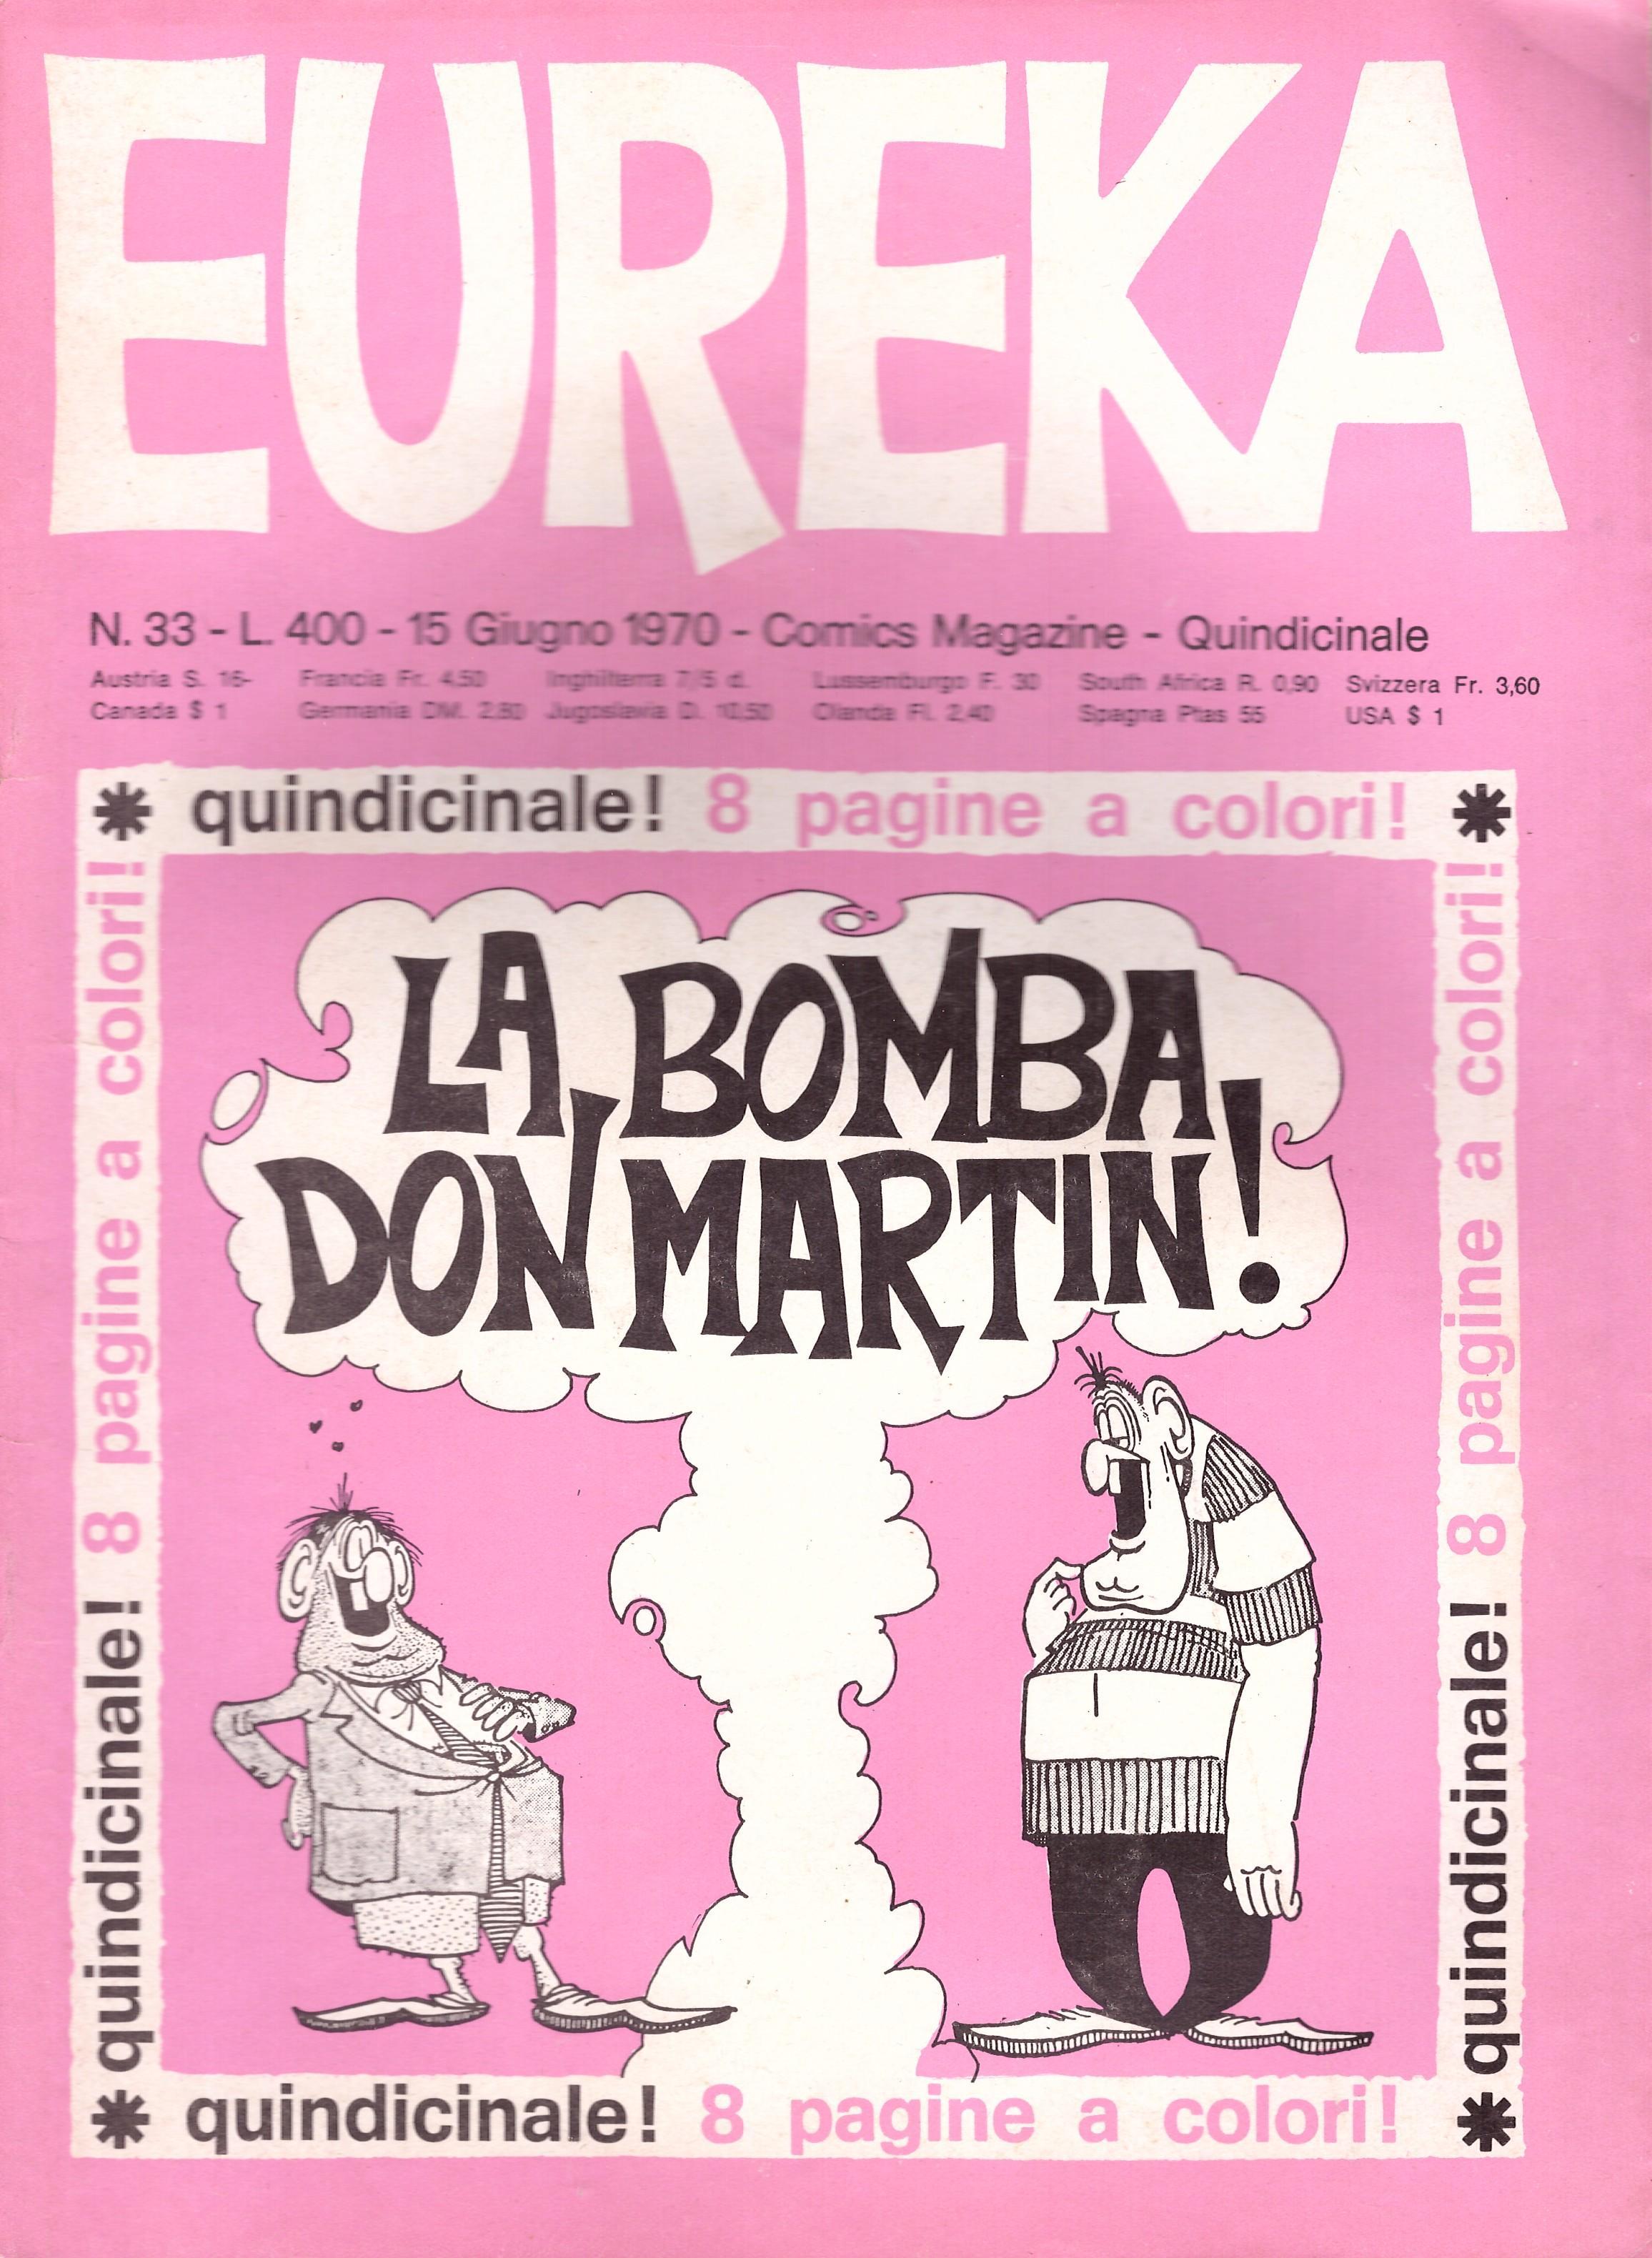 Eureka #33 • Italy